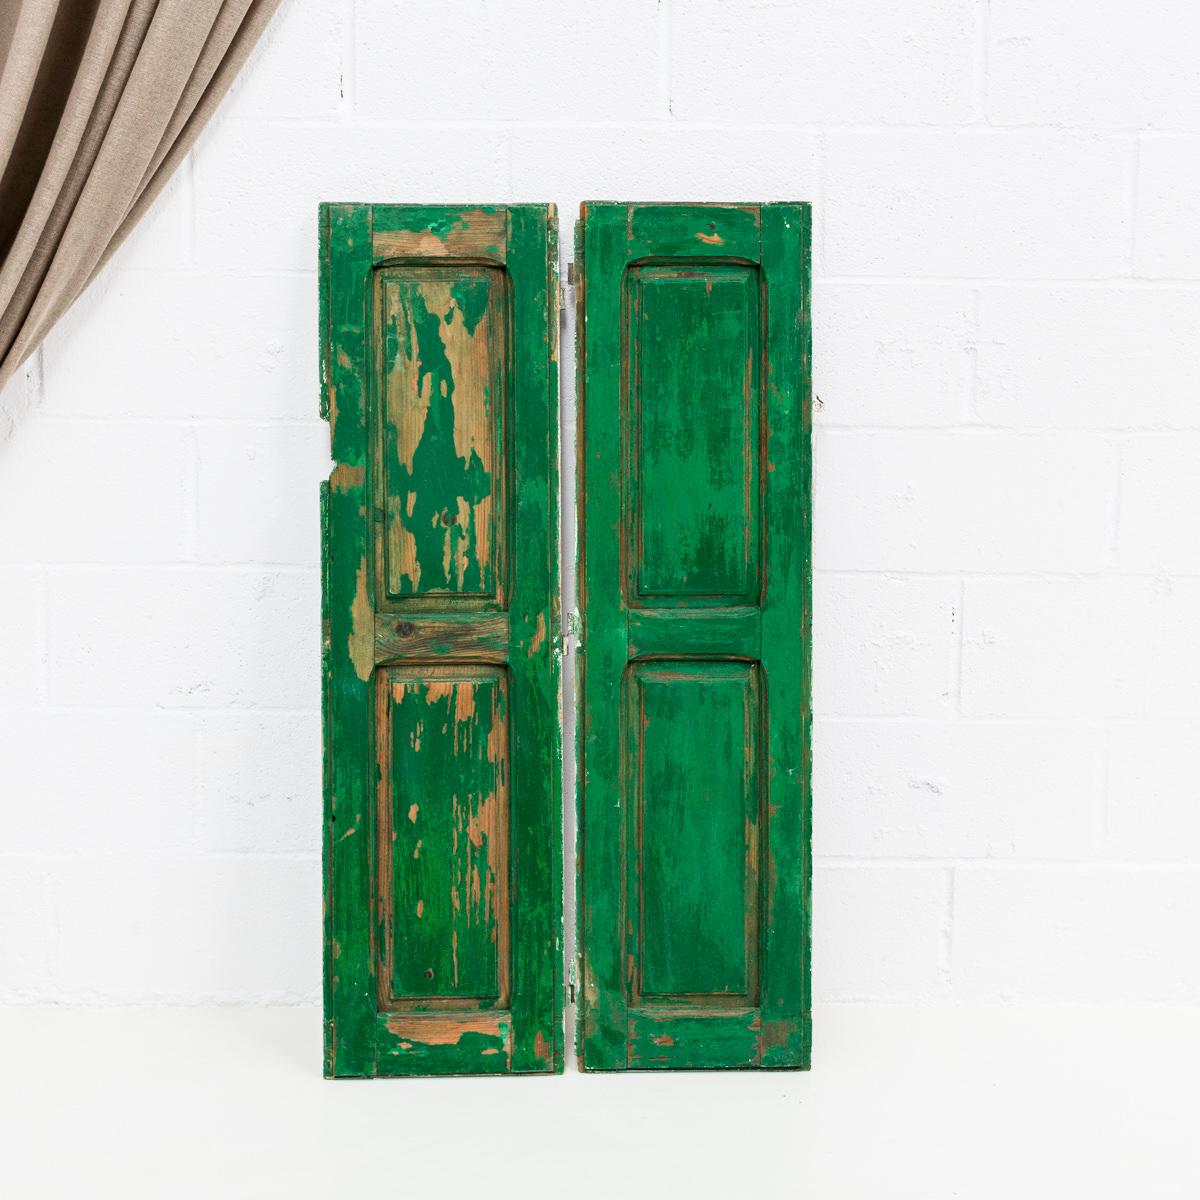 Contraventana fort erie memorias del ayer alquiler for Decoracion puertas vintage